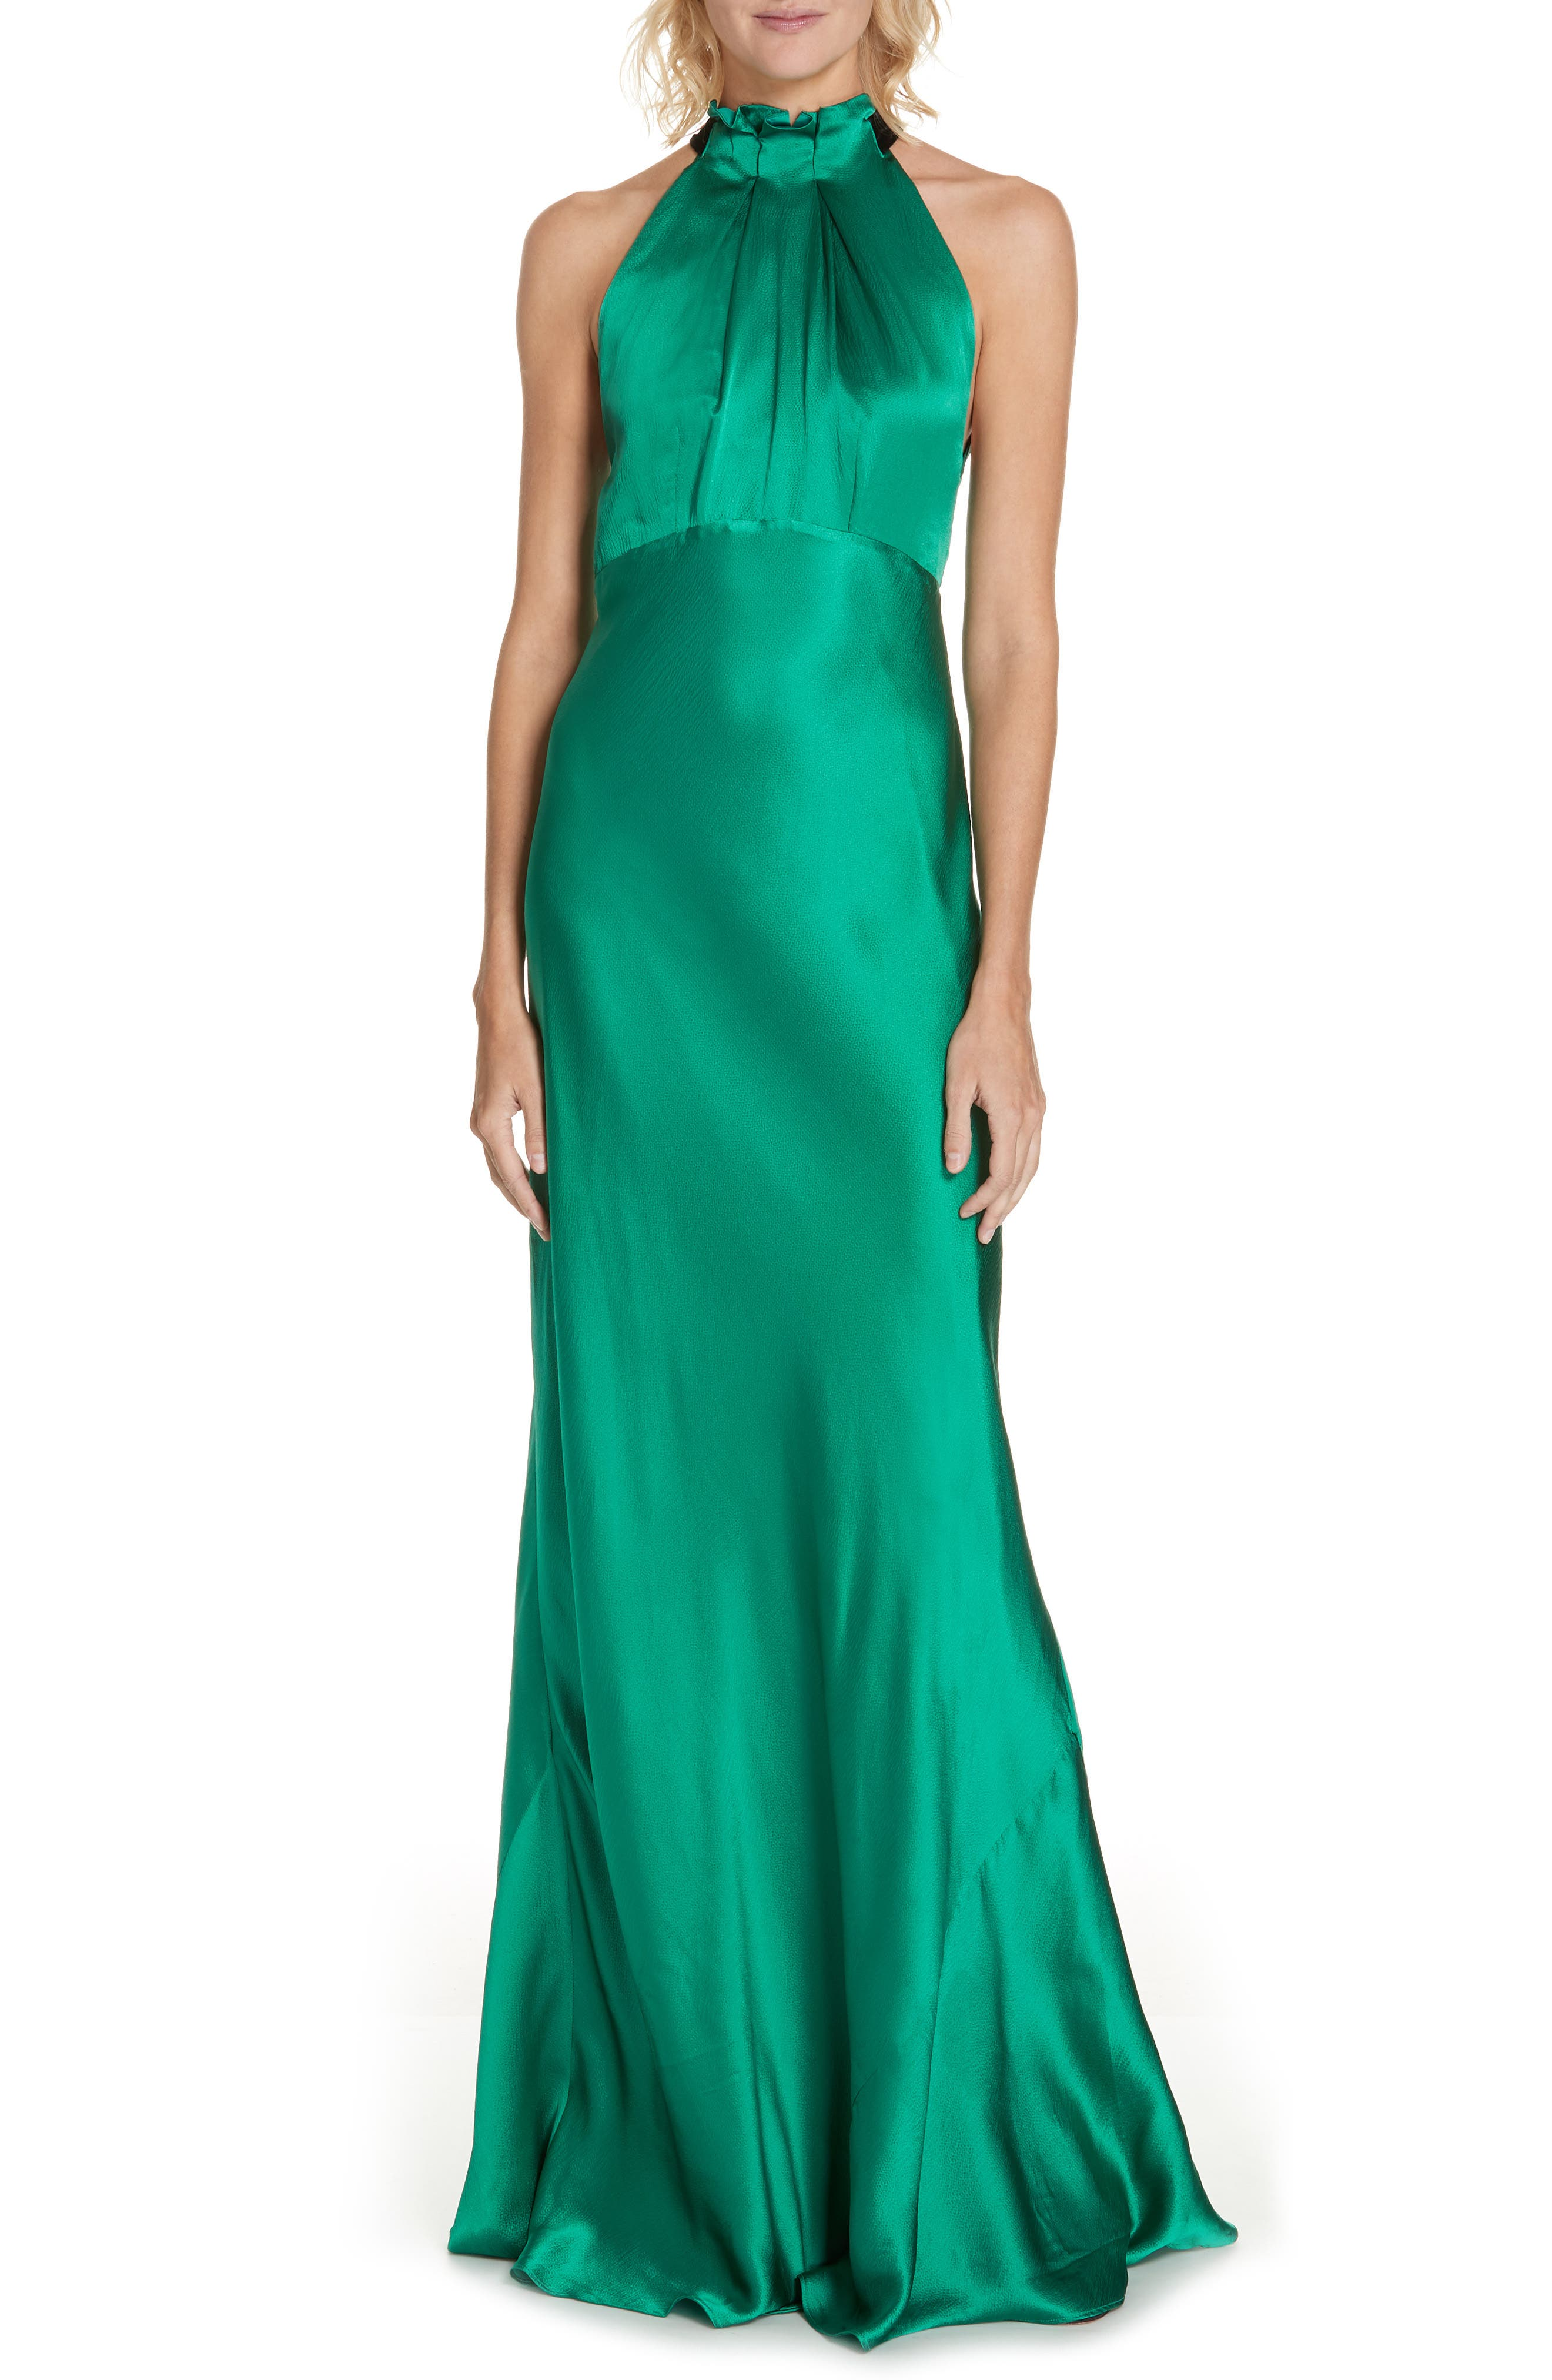 SALONI, Michelle Velvet Bow Silk Halter Gown, Main thumbnail 1, color, 310